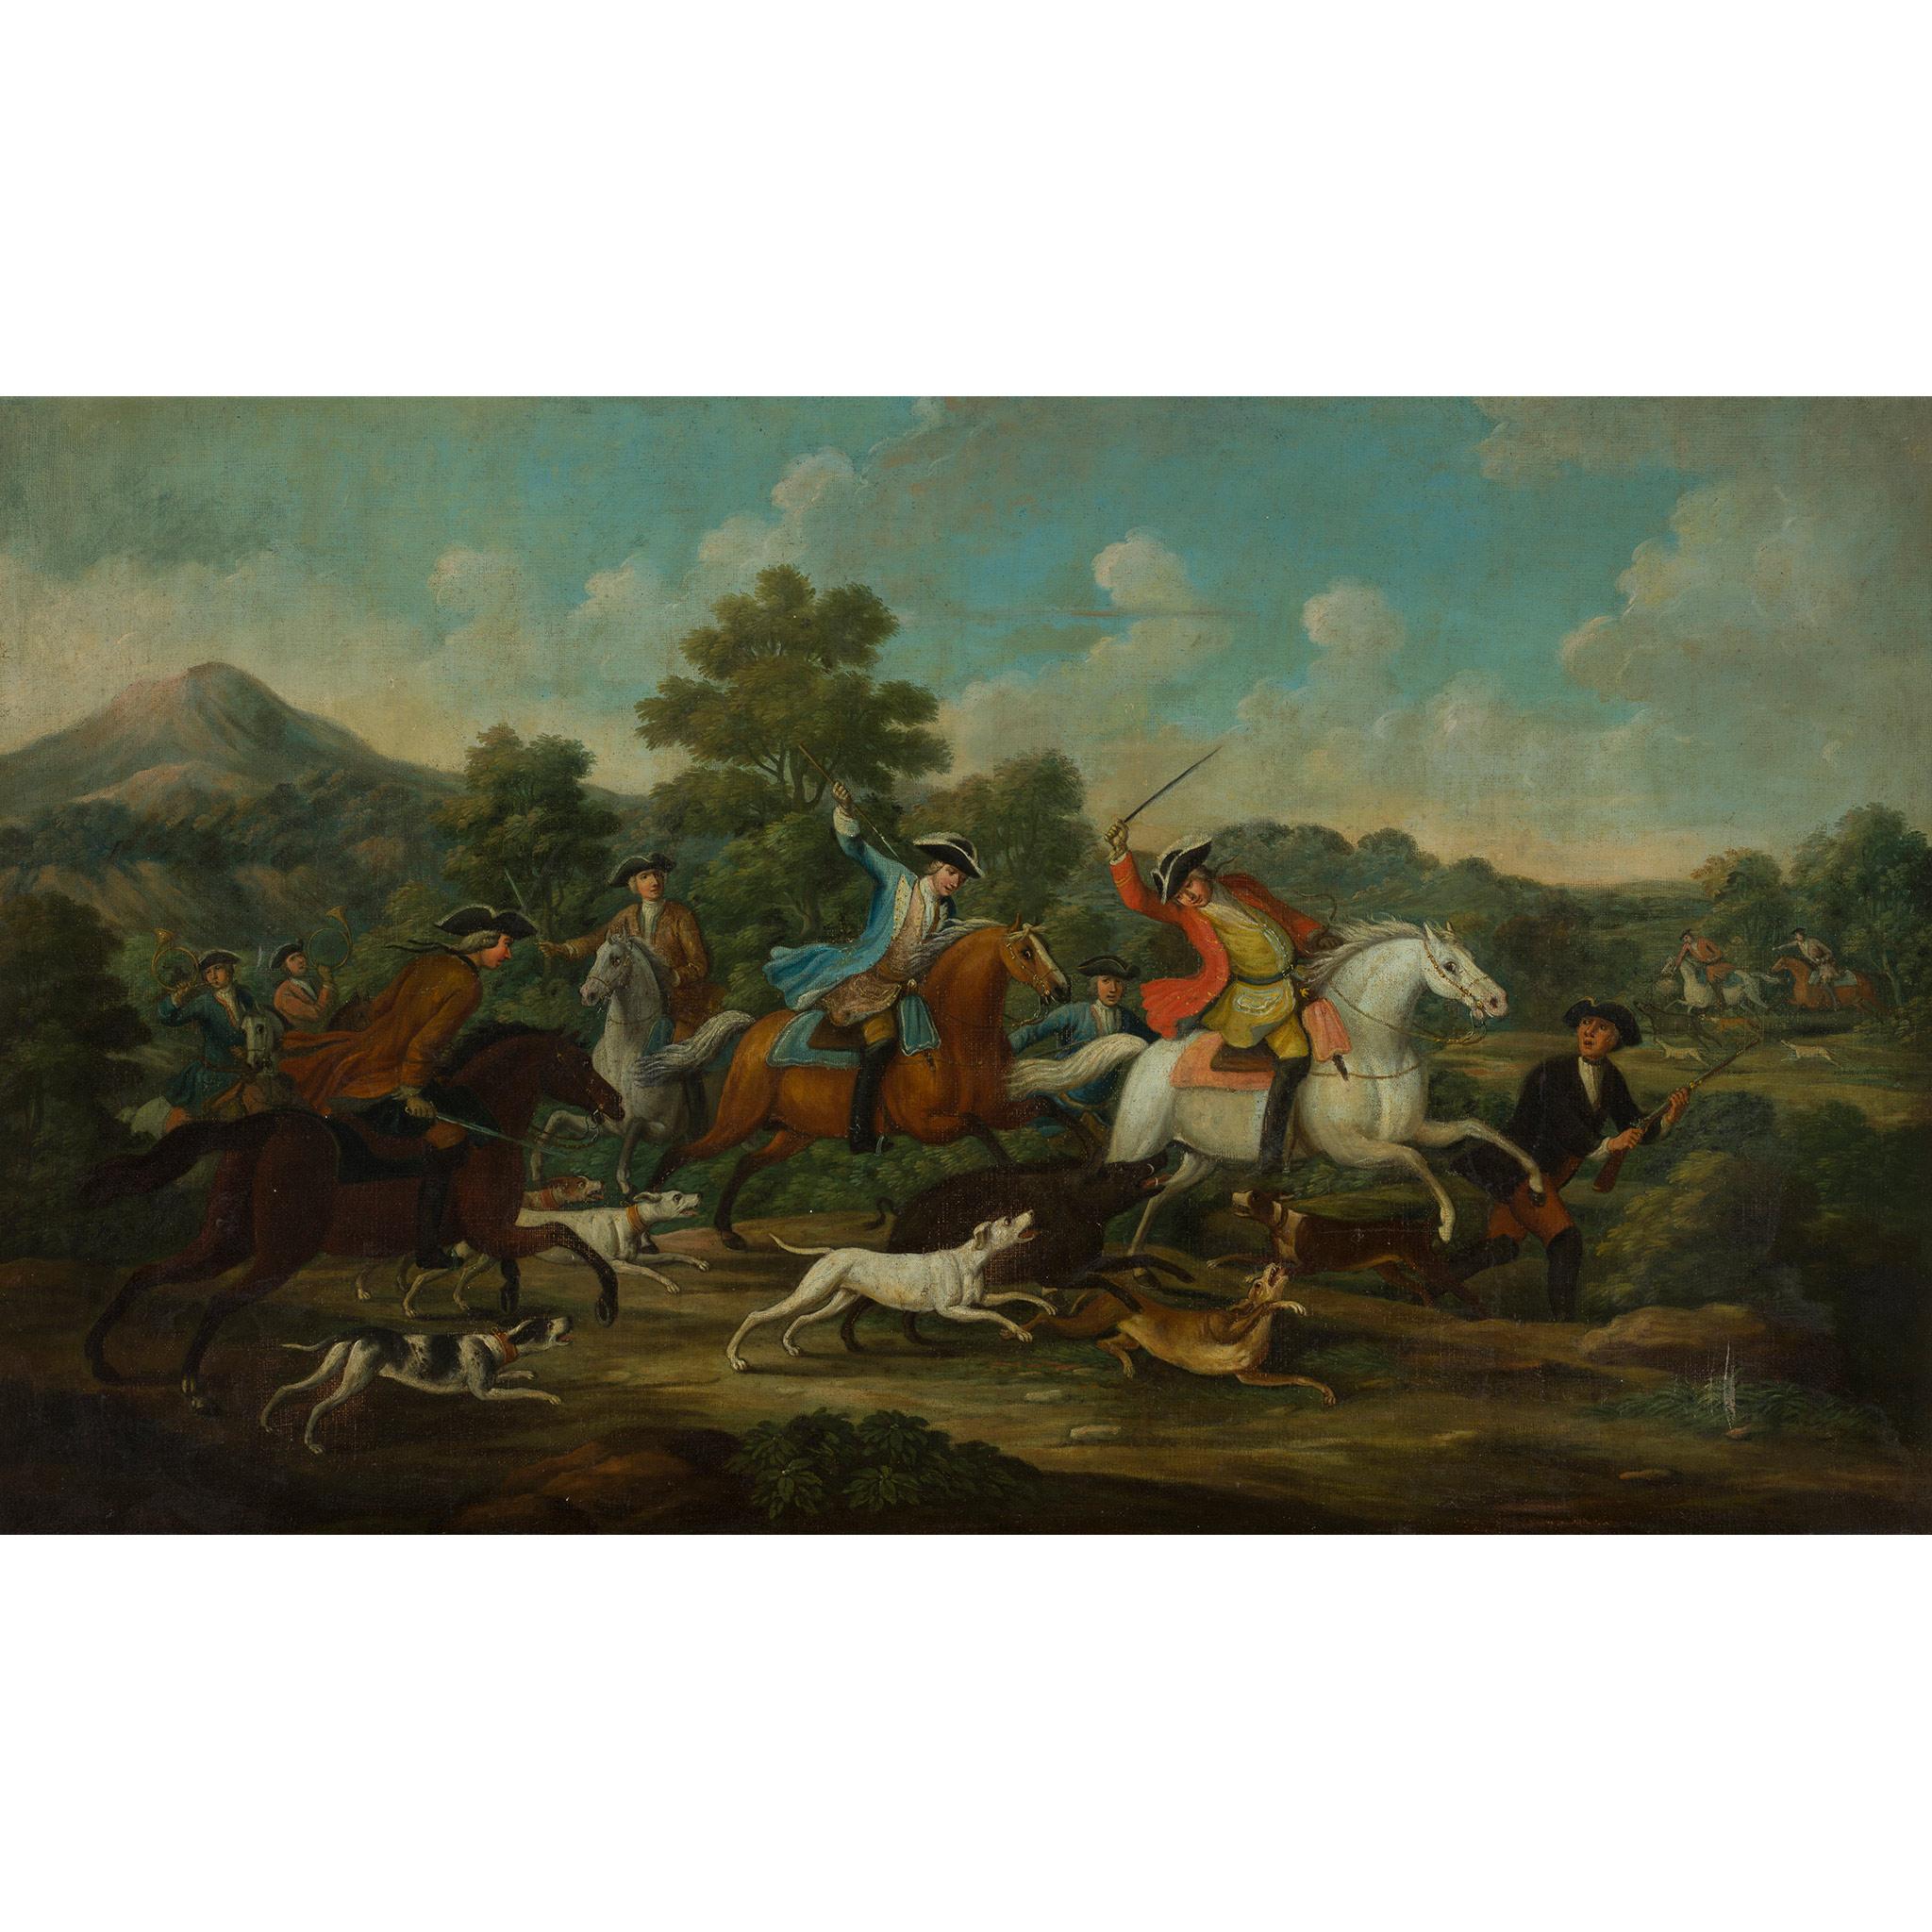 18TH CENTURY FRENCH SCHOOL ELEGANT FIGURES BOAR HUNTING - Image 2 of 8